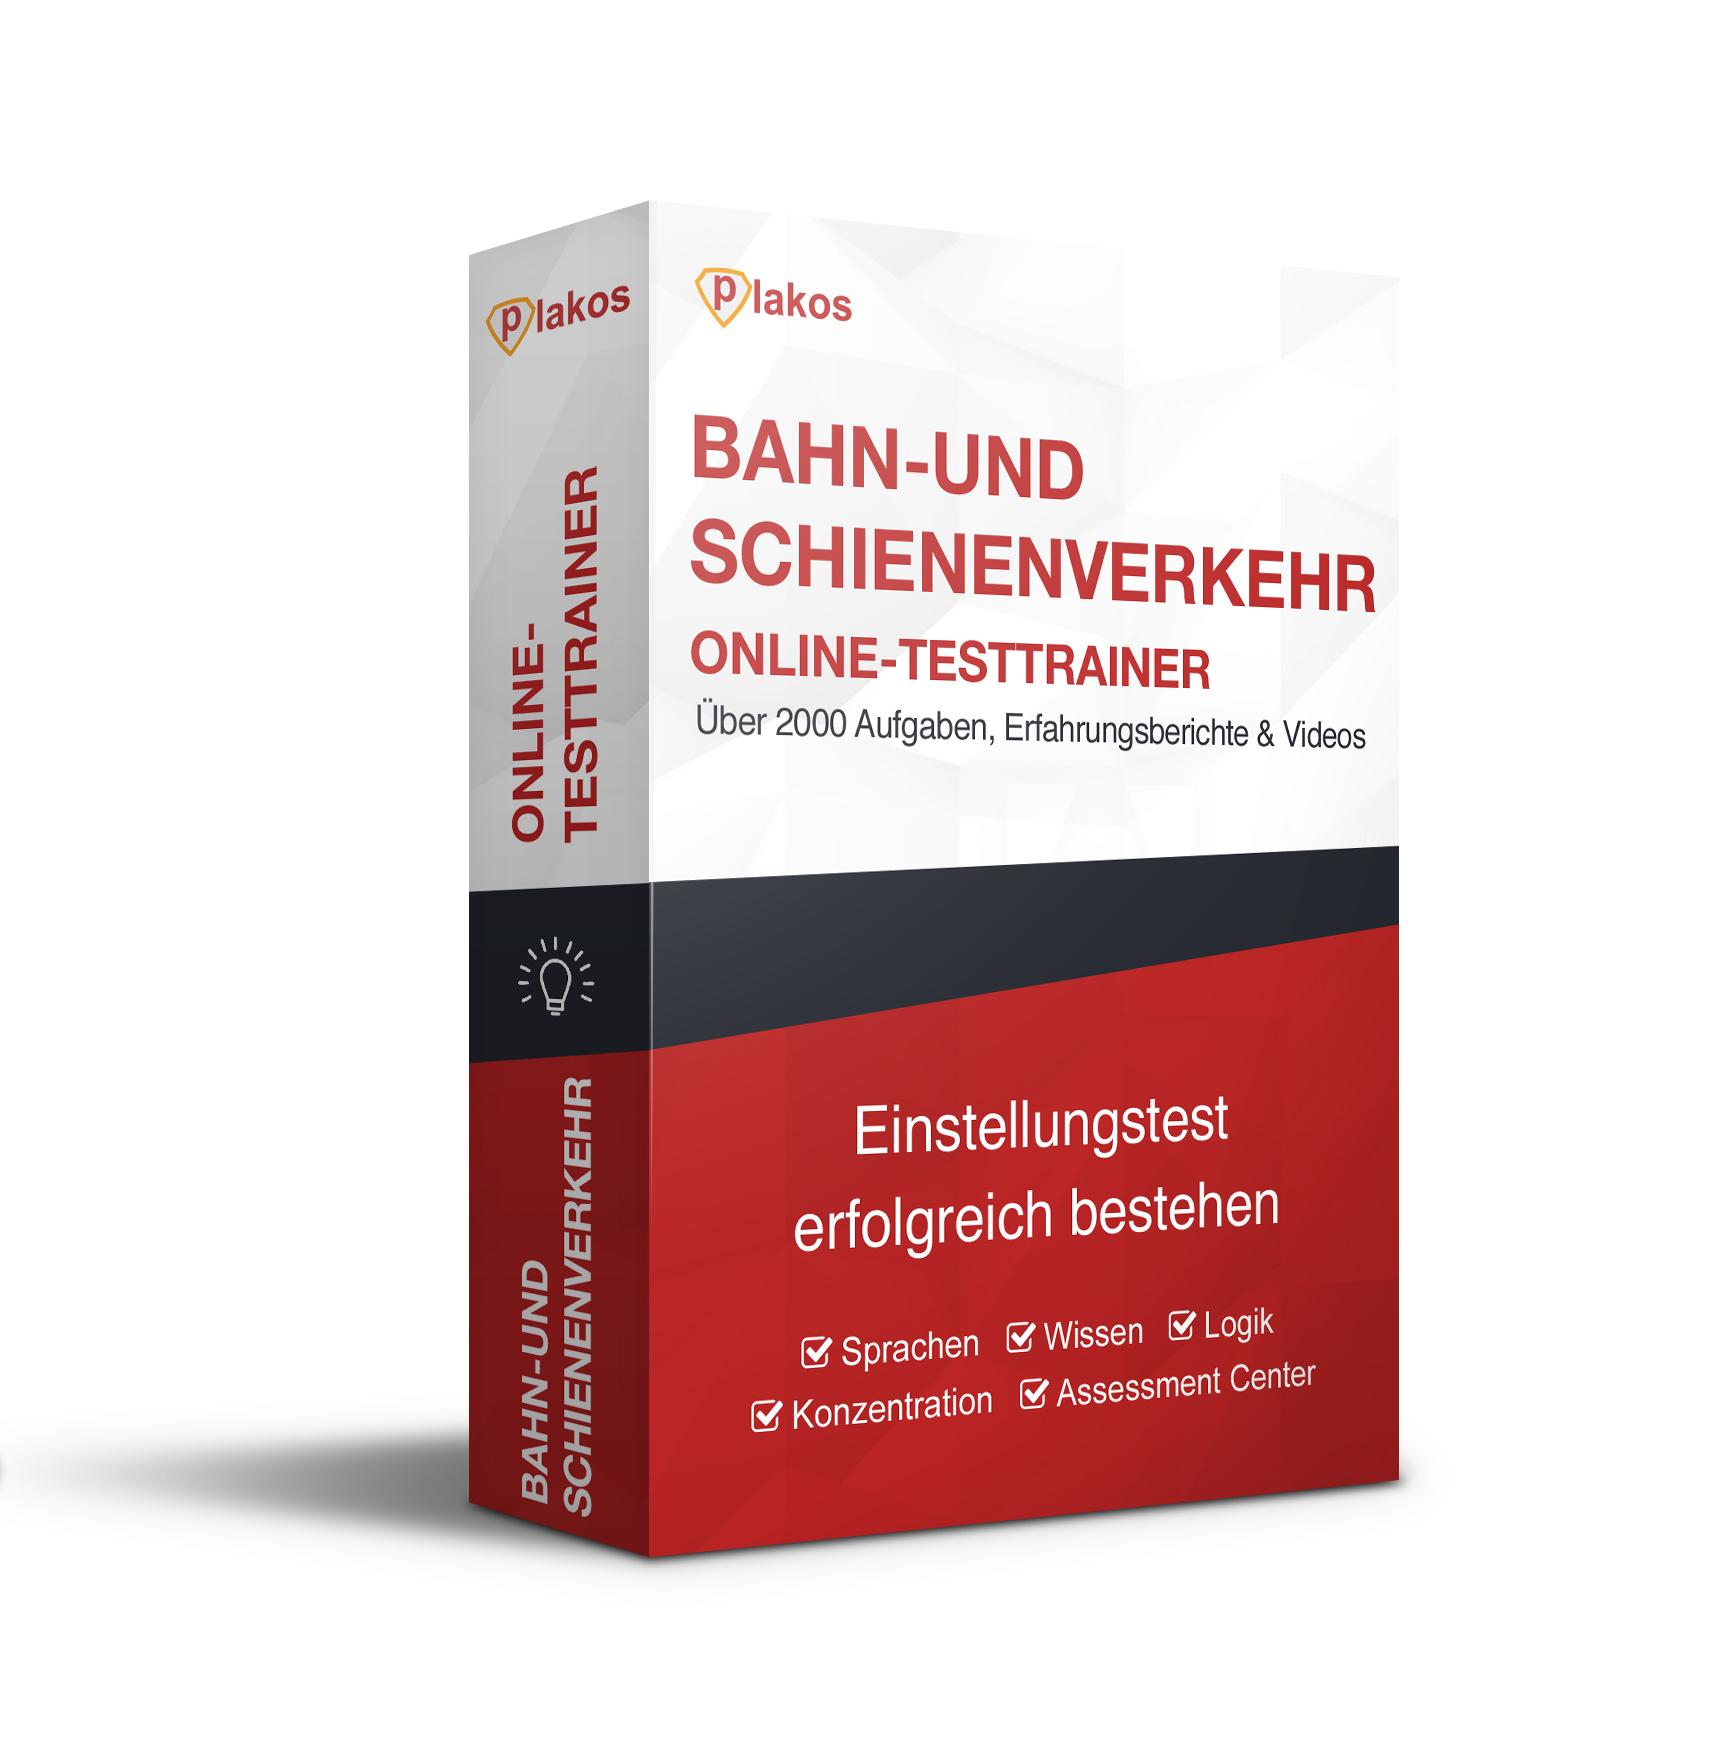 product-box-2018-bahn(1)